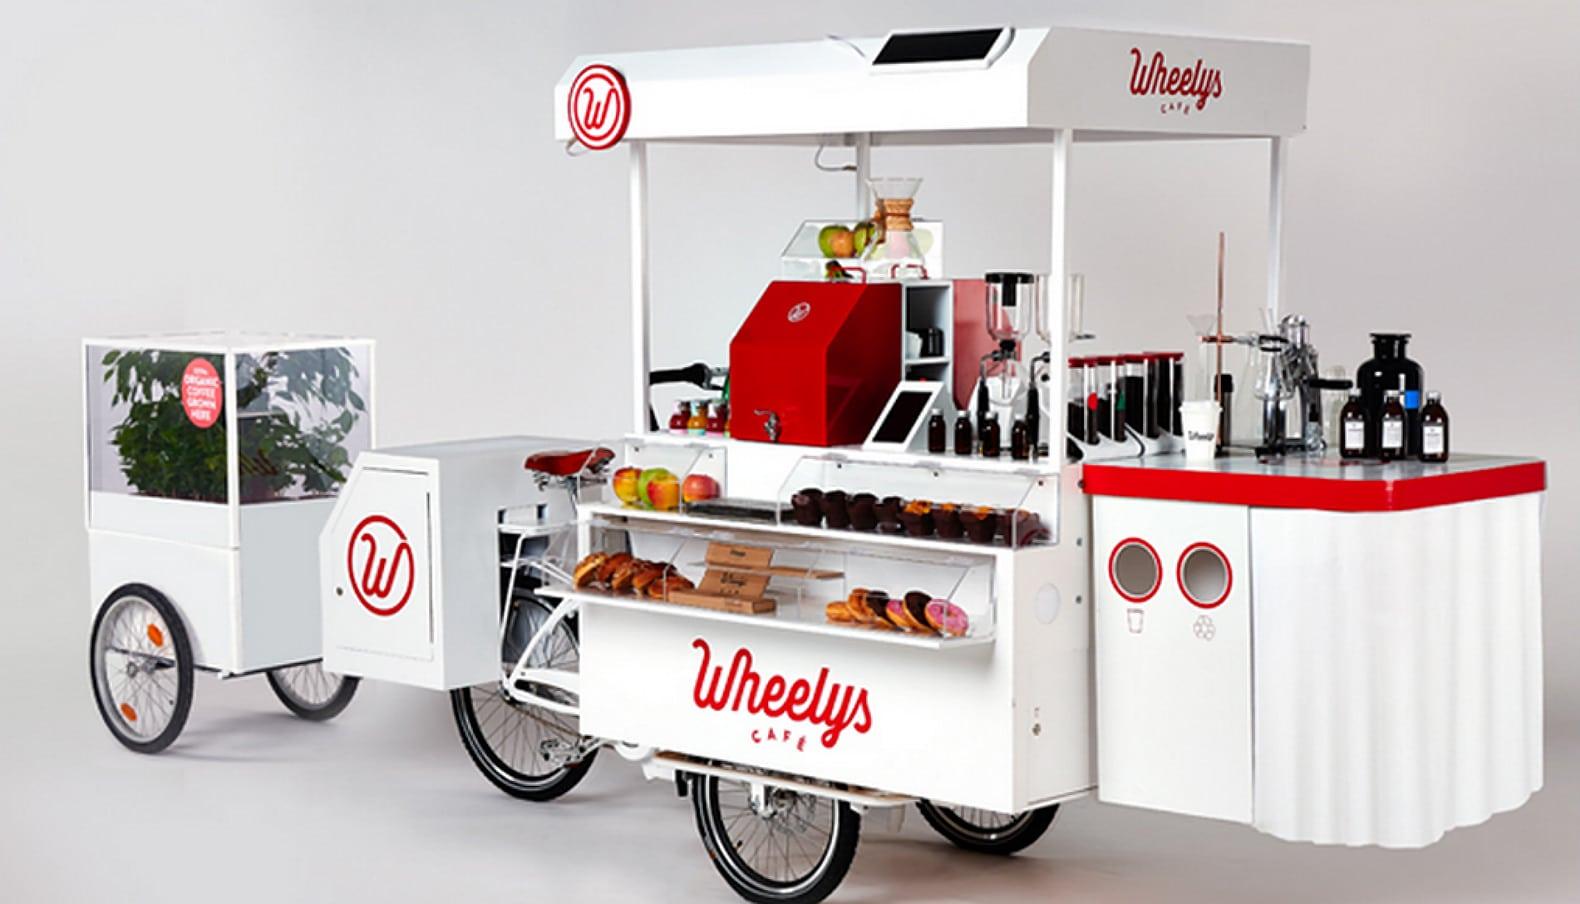 wheelys-3-1